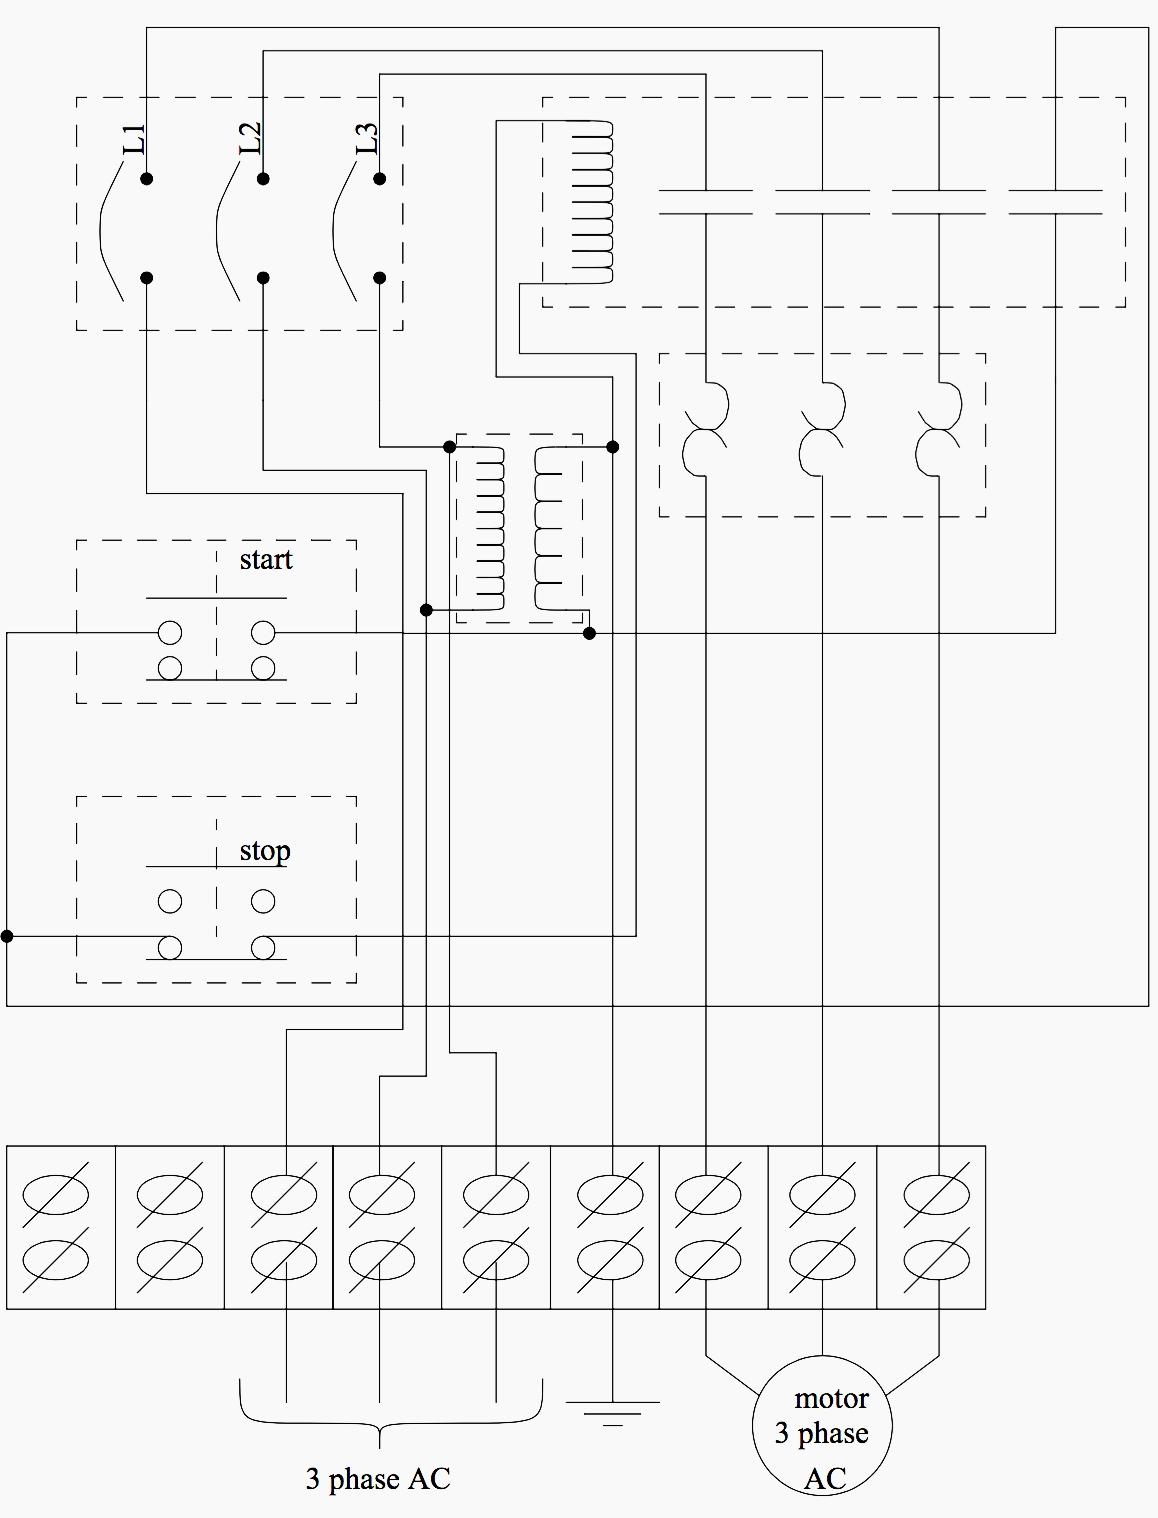 hight resolution of circuit diagram of plc control pump motor controlcircuit circuit electrical circuit diagram plc new wiring diagram